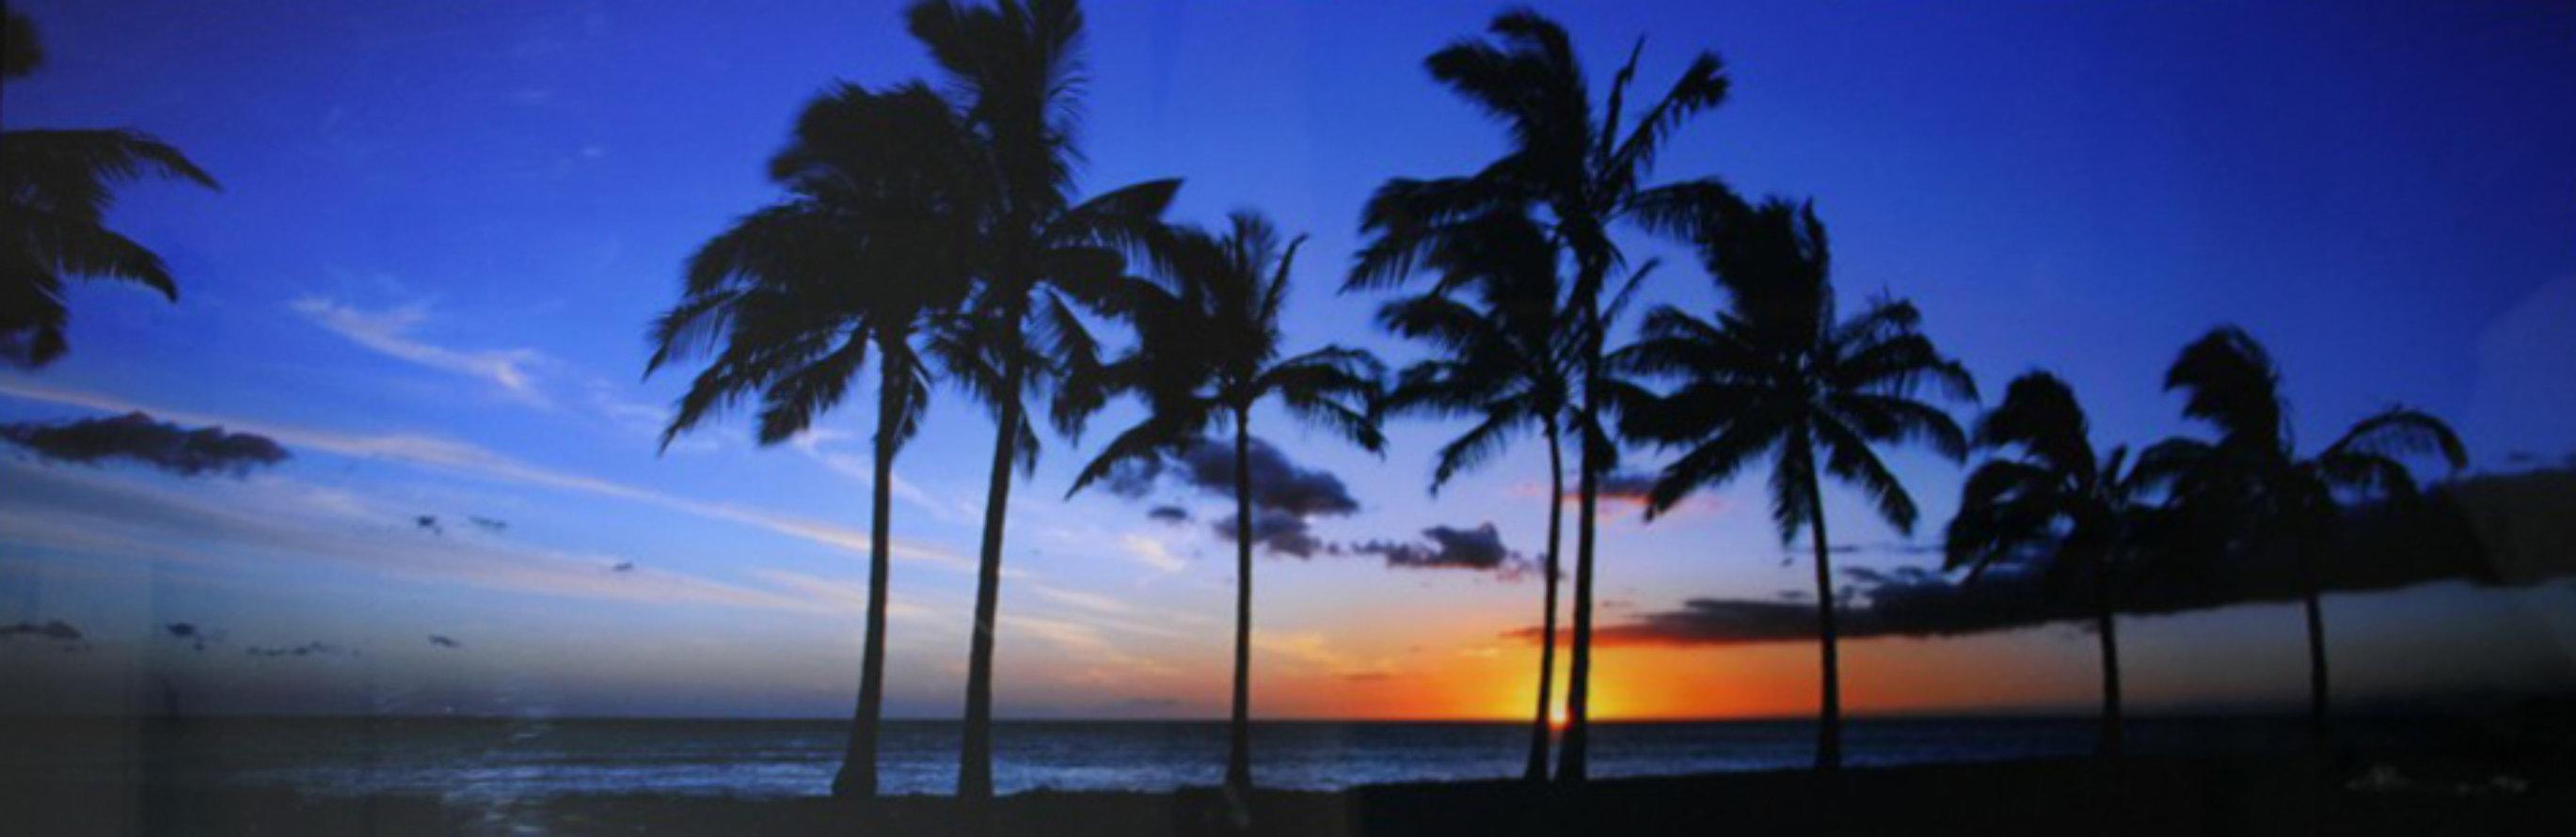 Waikiki Palms, Hawaii 1.5M Huge Panorama by Peter Lik